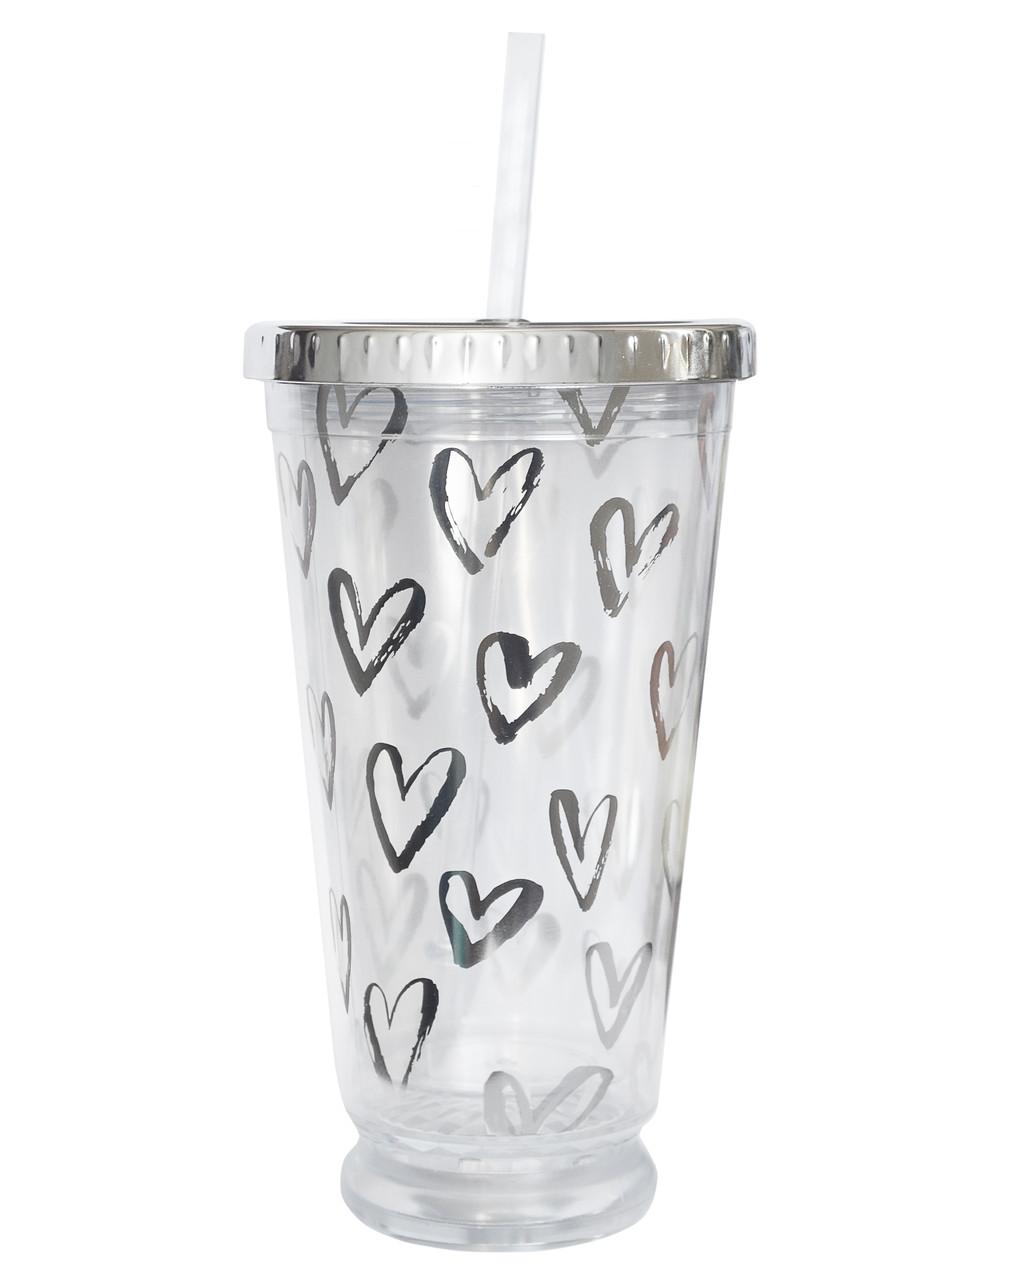 Тамблер-стакан YES с подсветкой Hearts 490мл фольга с трубочкой код: 707045